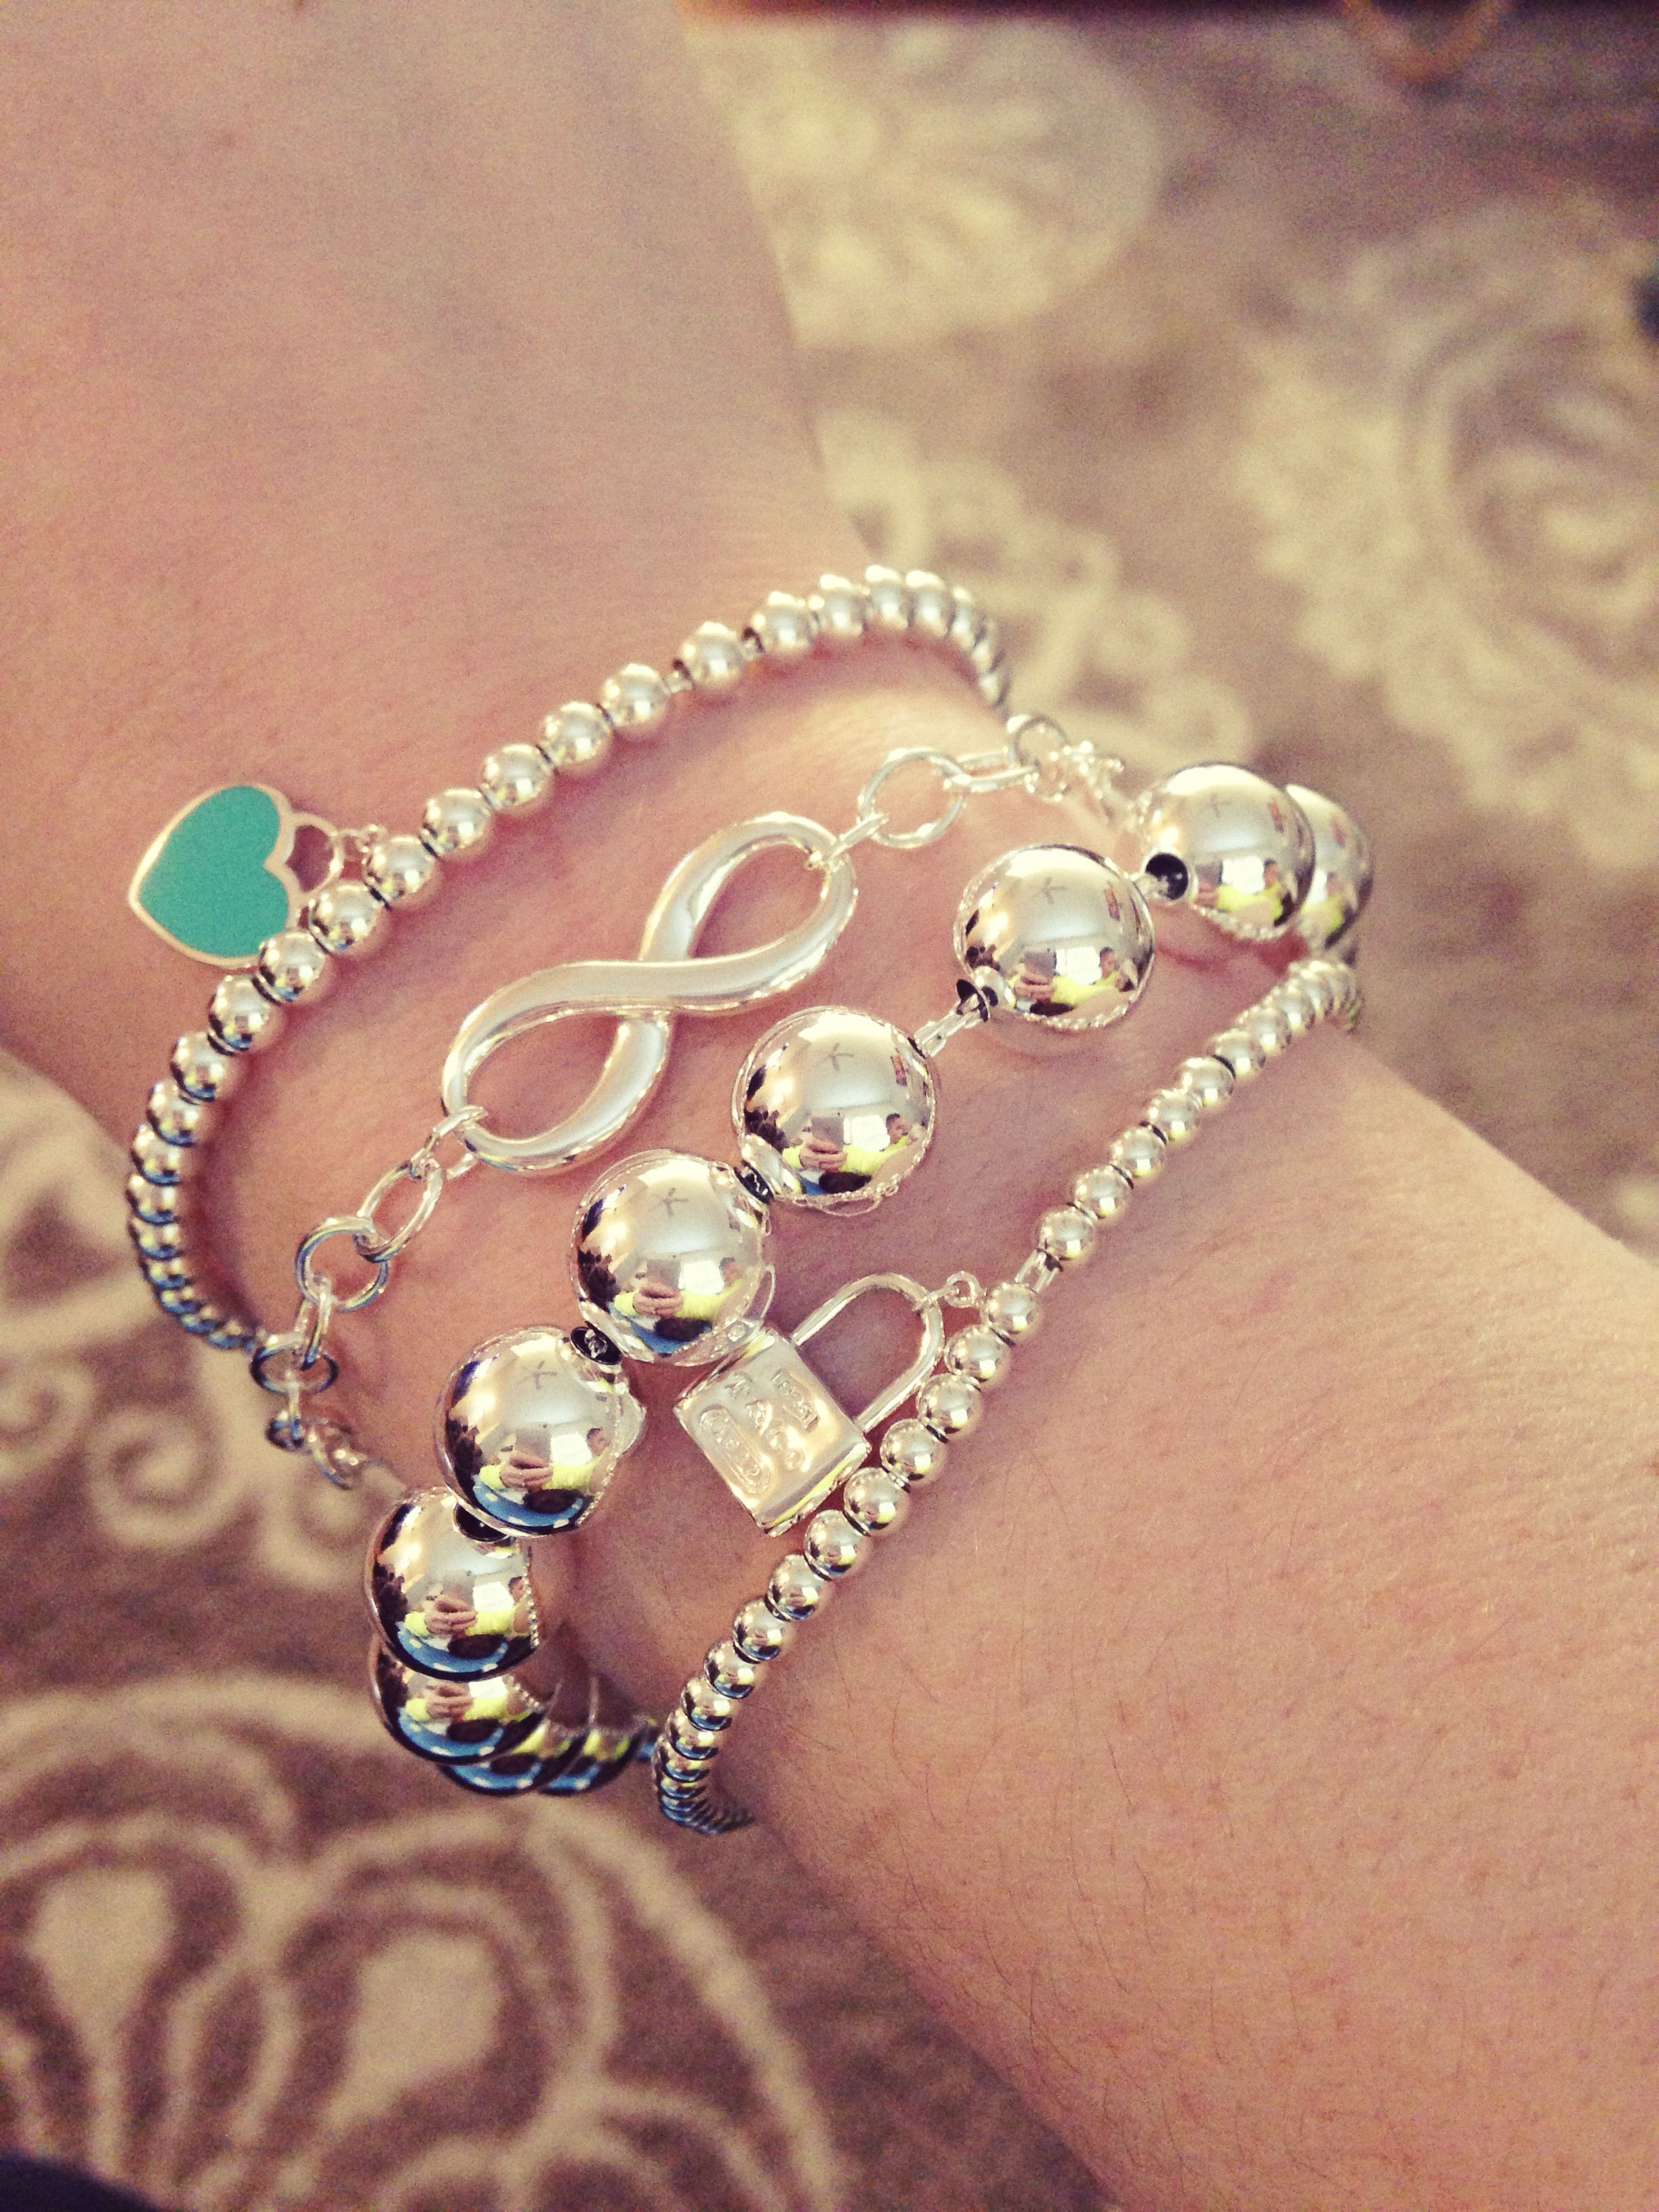 My New Tiffany's Bracelets :)